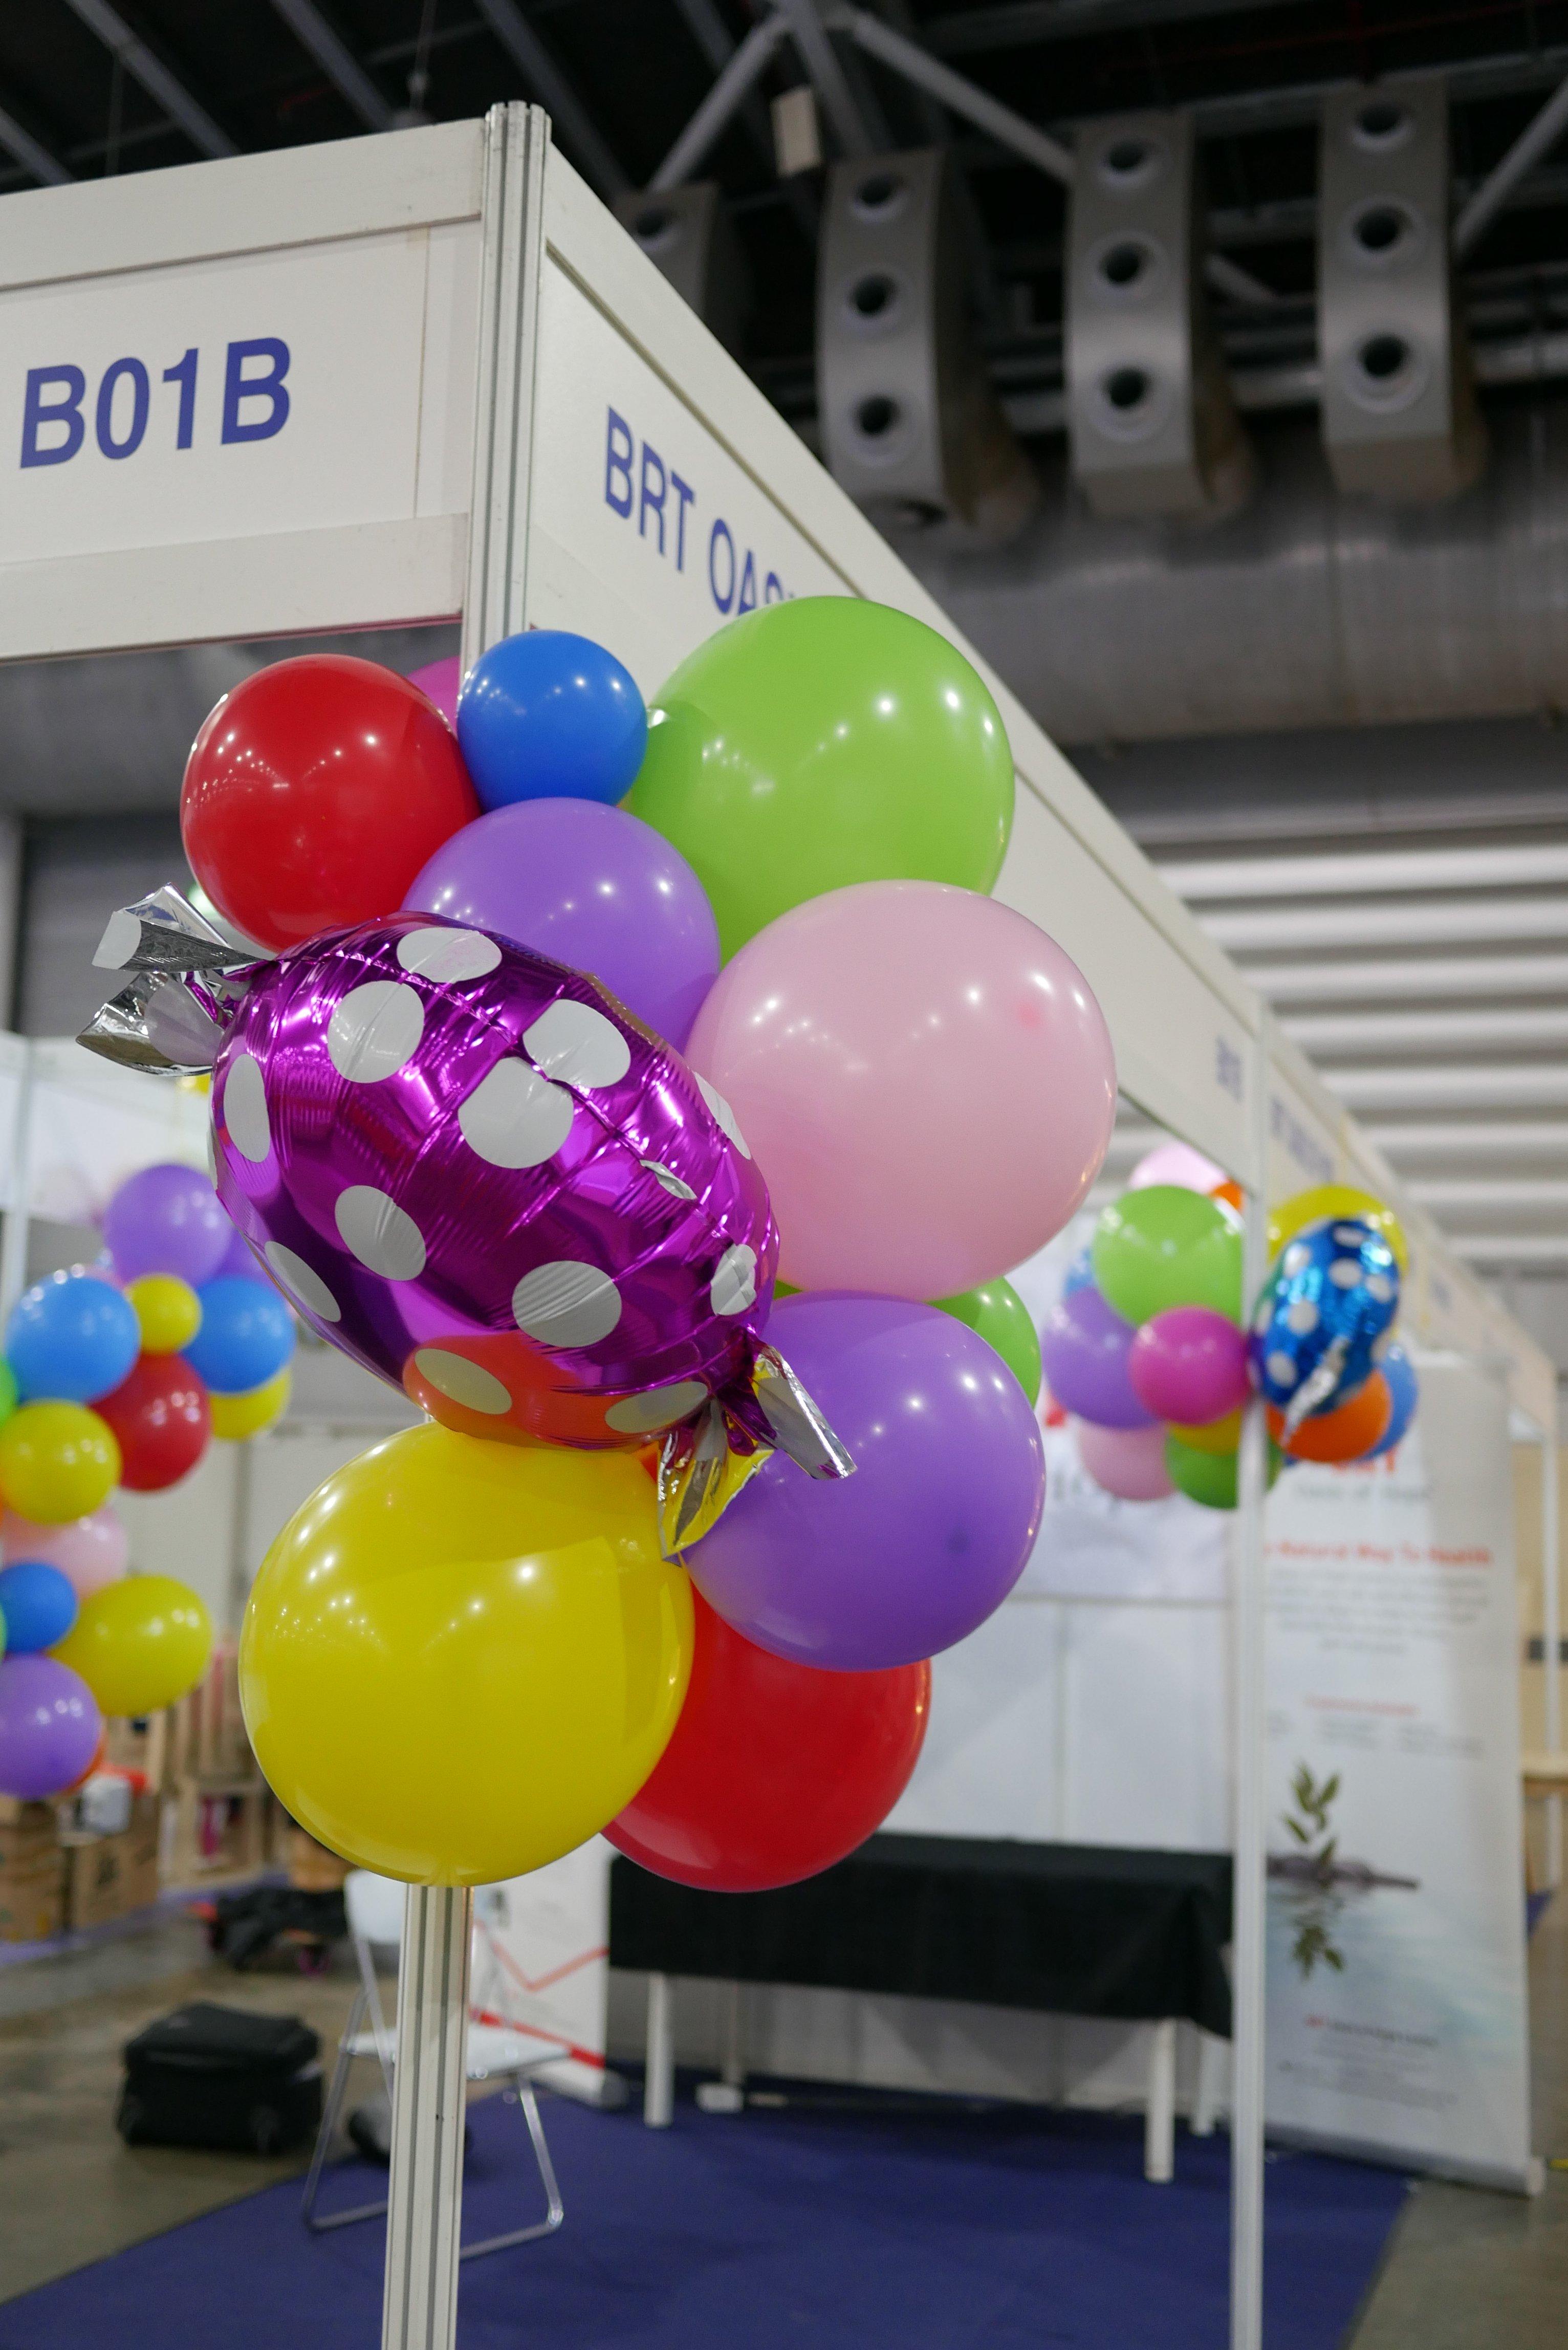 , Expo Exhibition Balloon Decorations, Singapore Balloon Decoration Services - Balloon Workshop and Balloon Sculpting